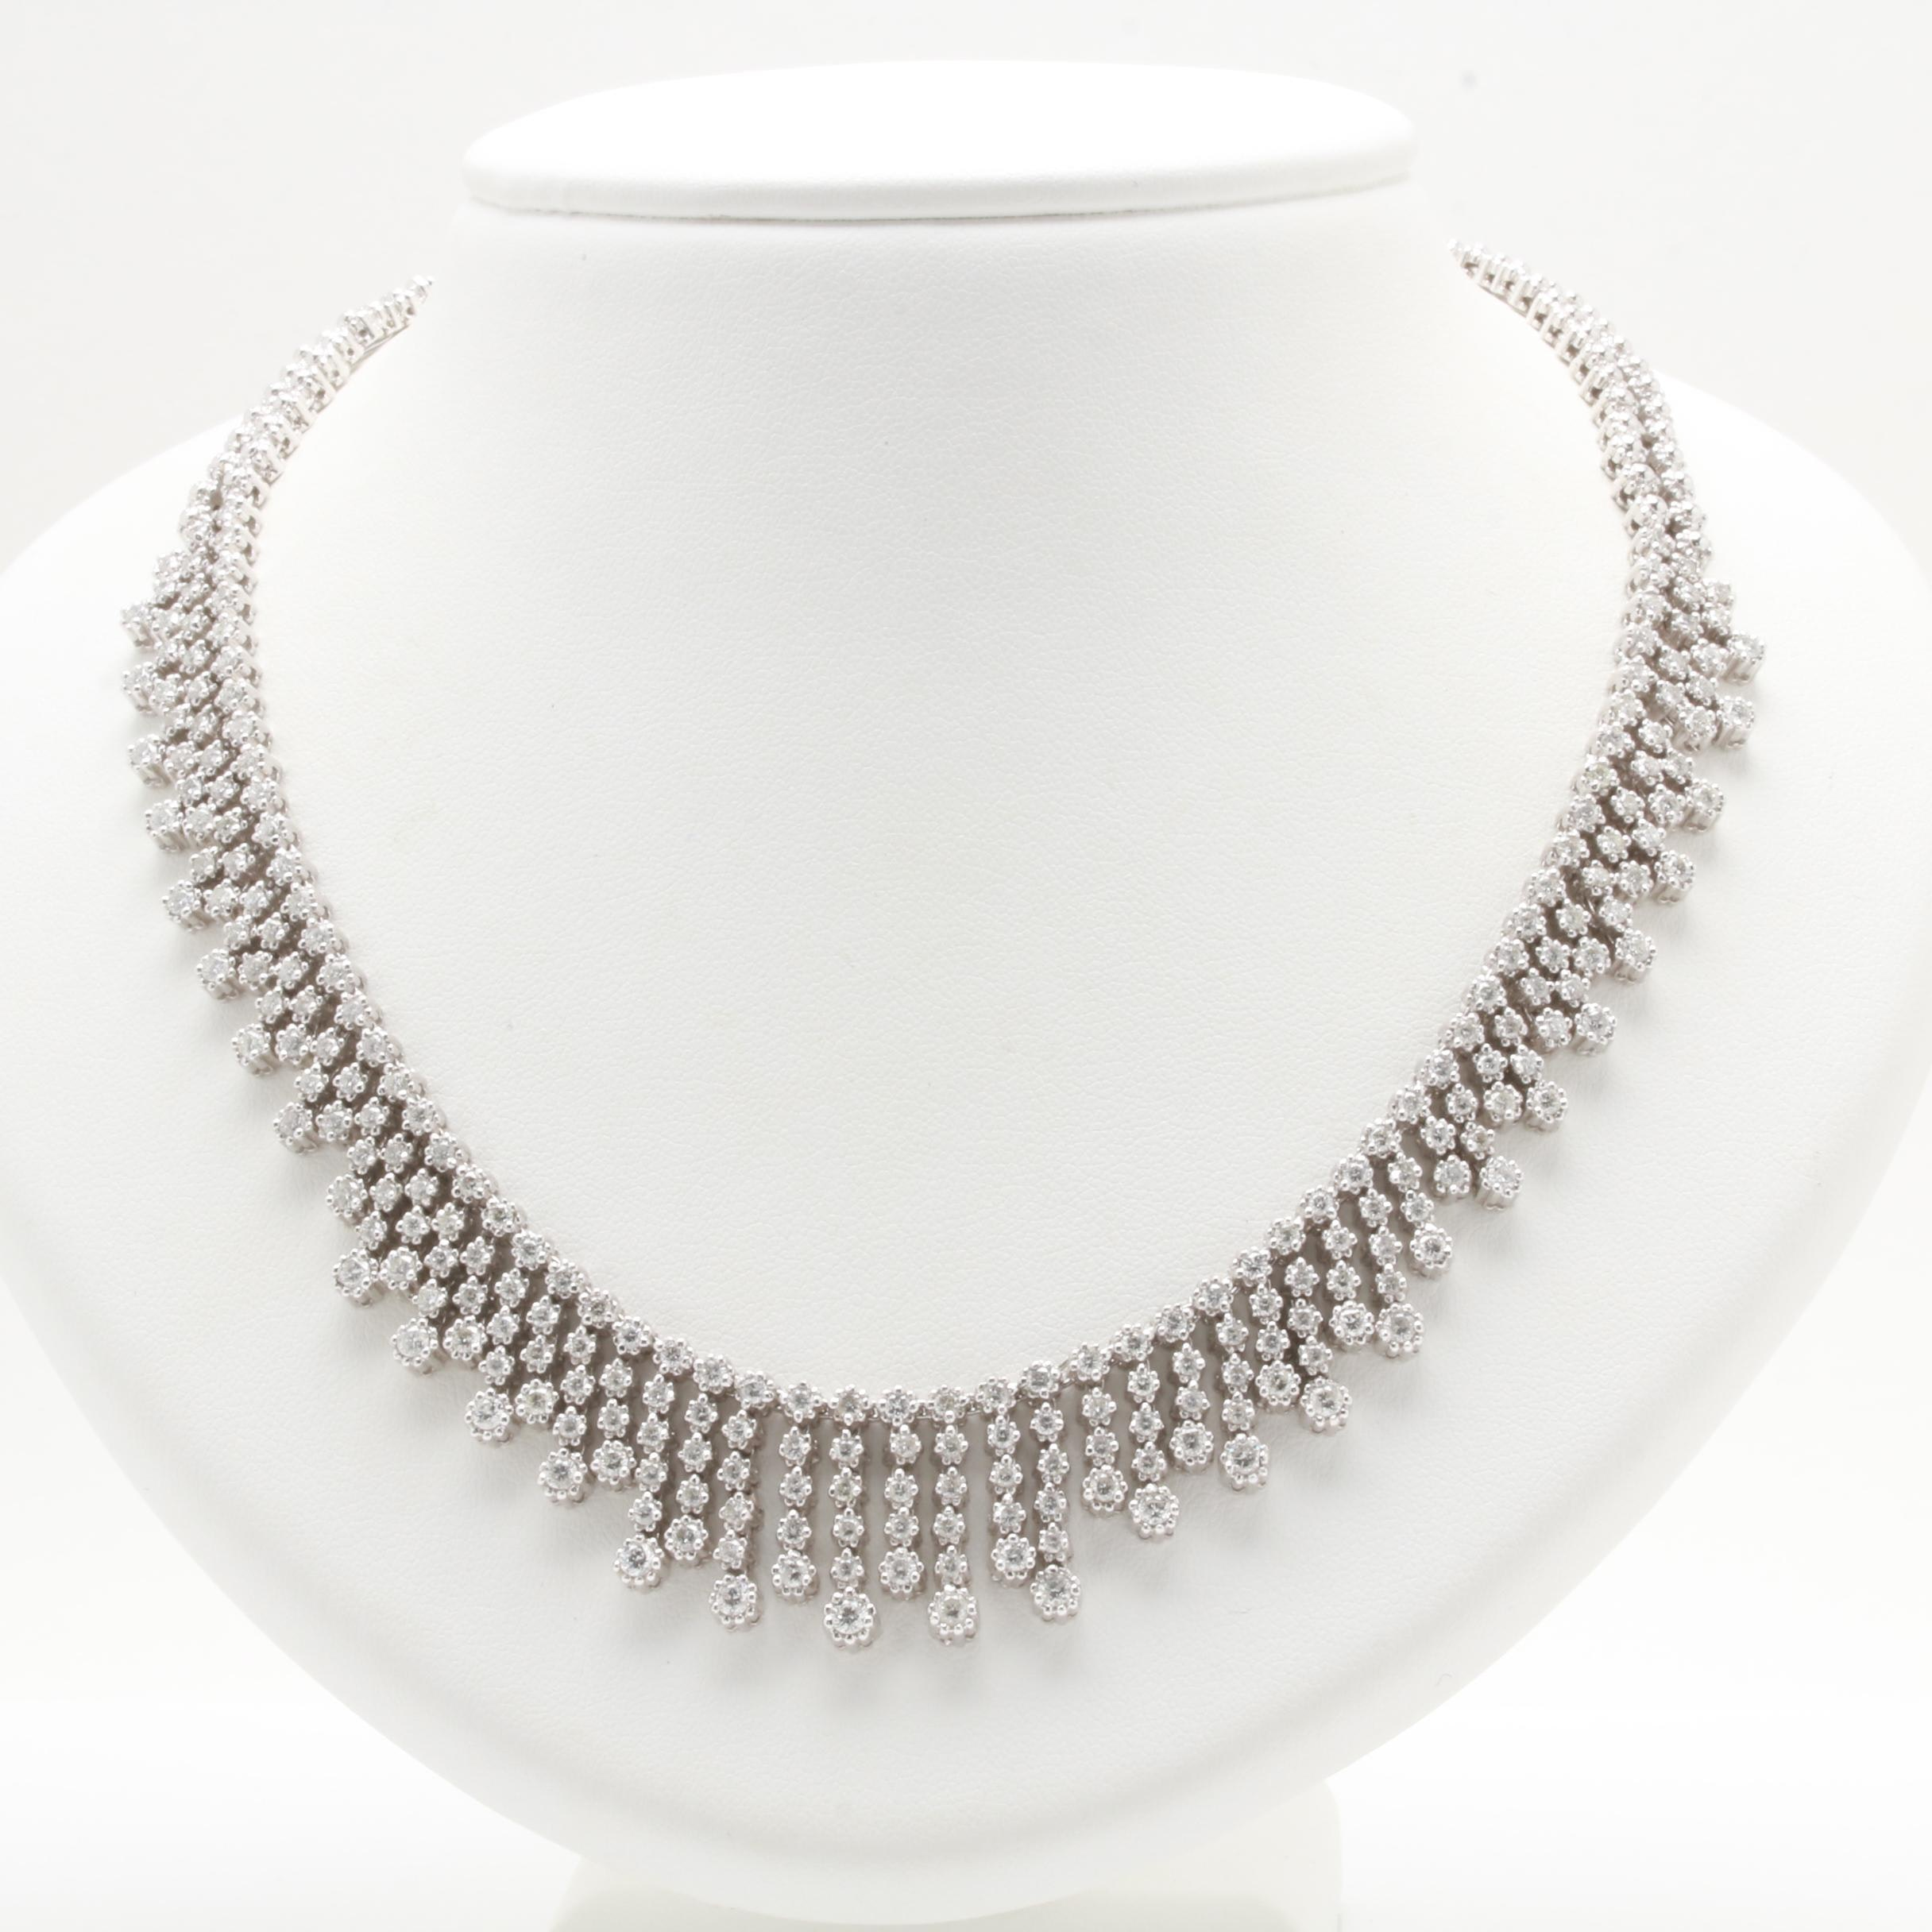 18K White Gold 7.05 CTW Diamond Necklace